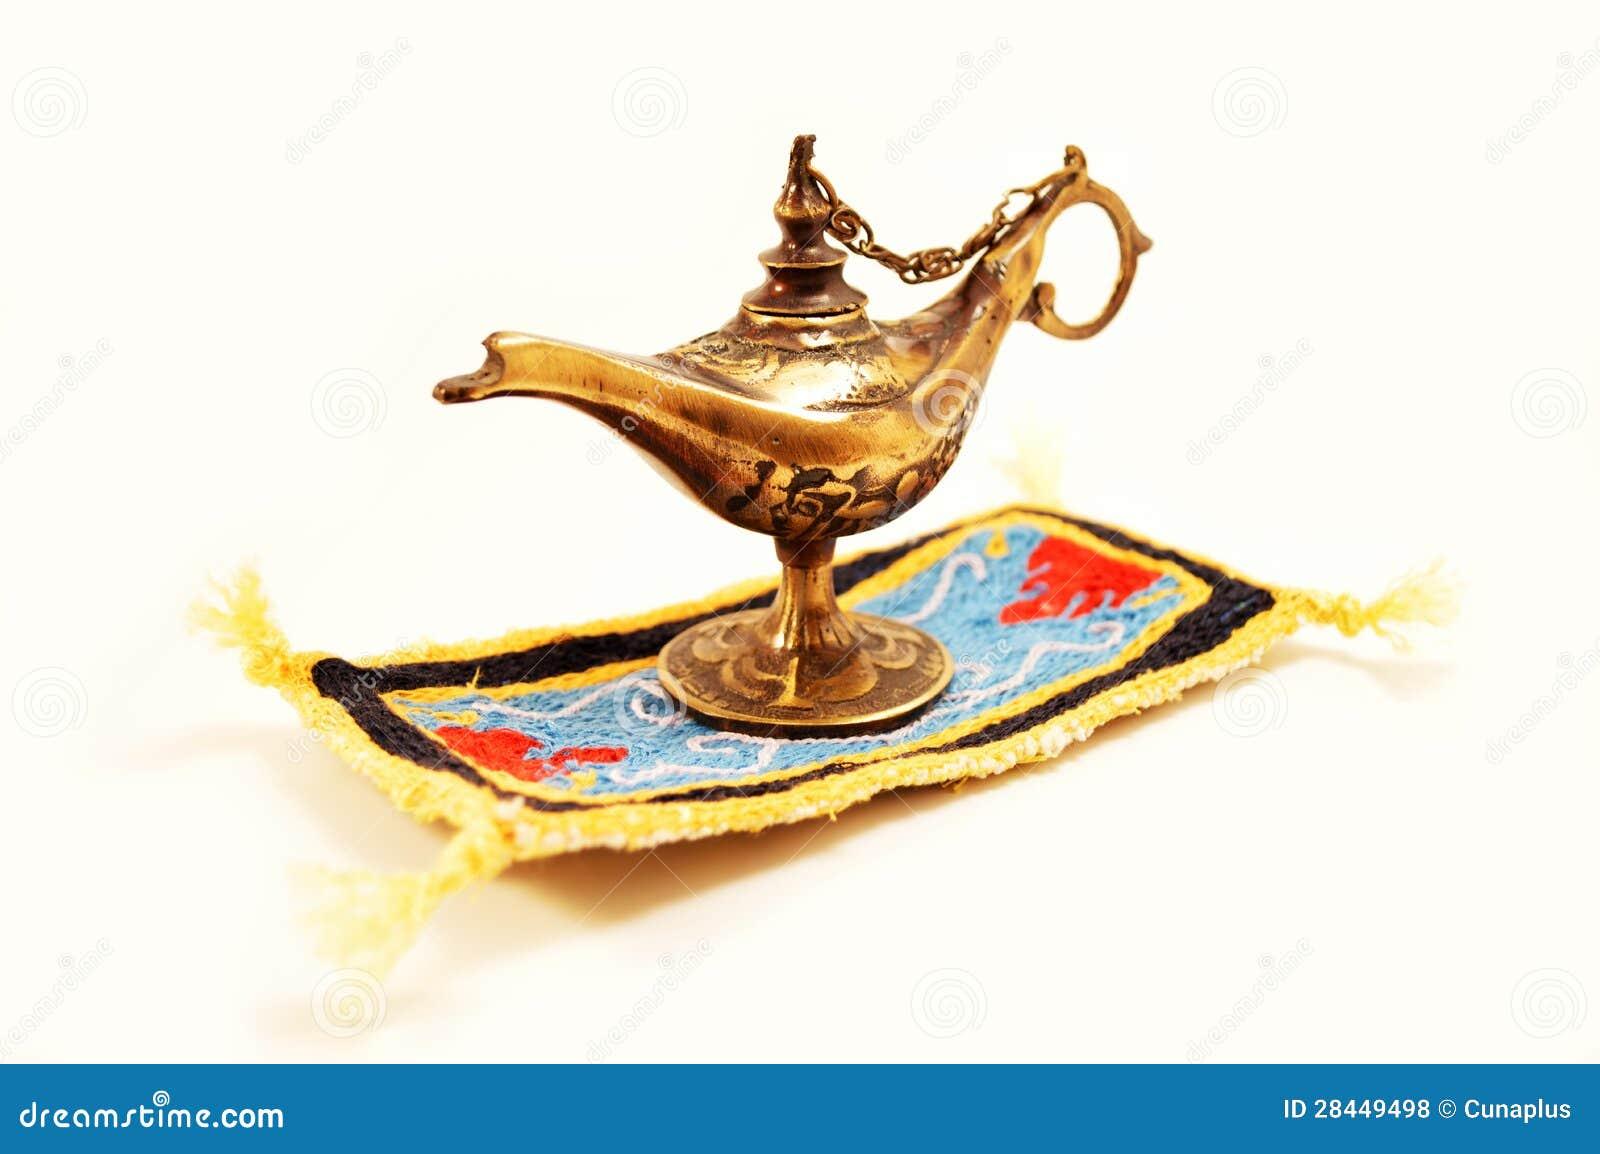 Photo Magic Carpet From Aladdin Images Blue